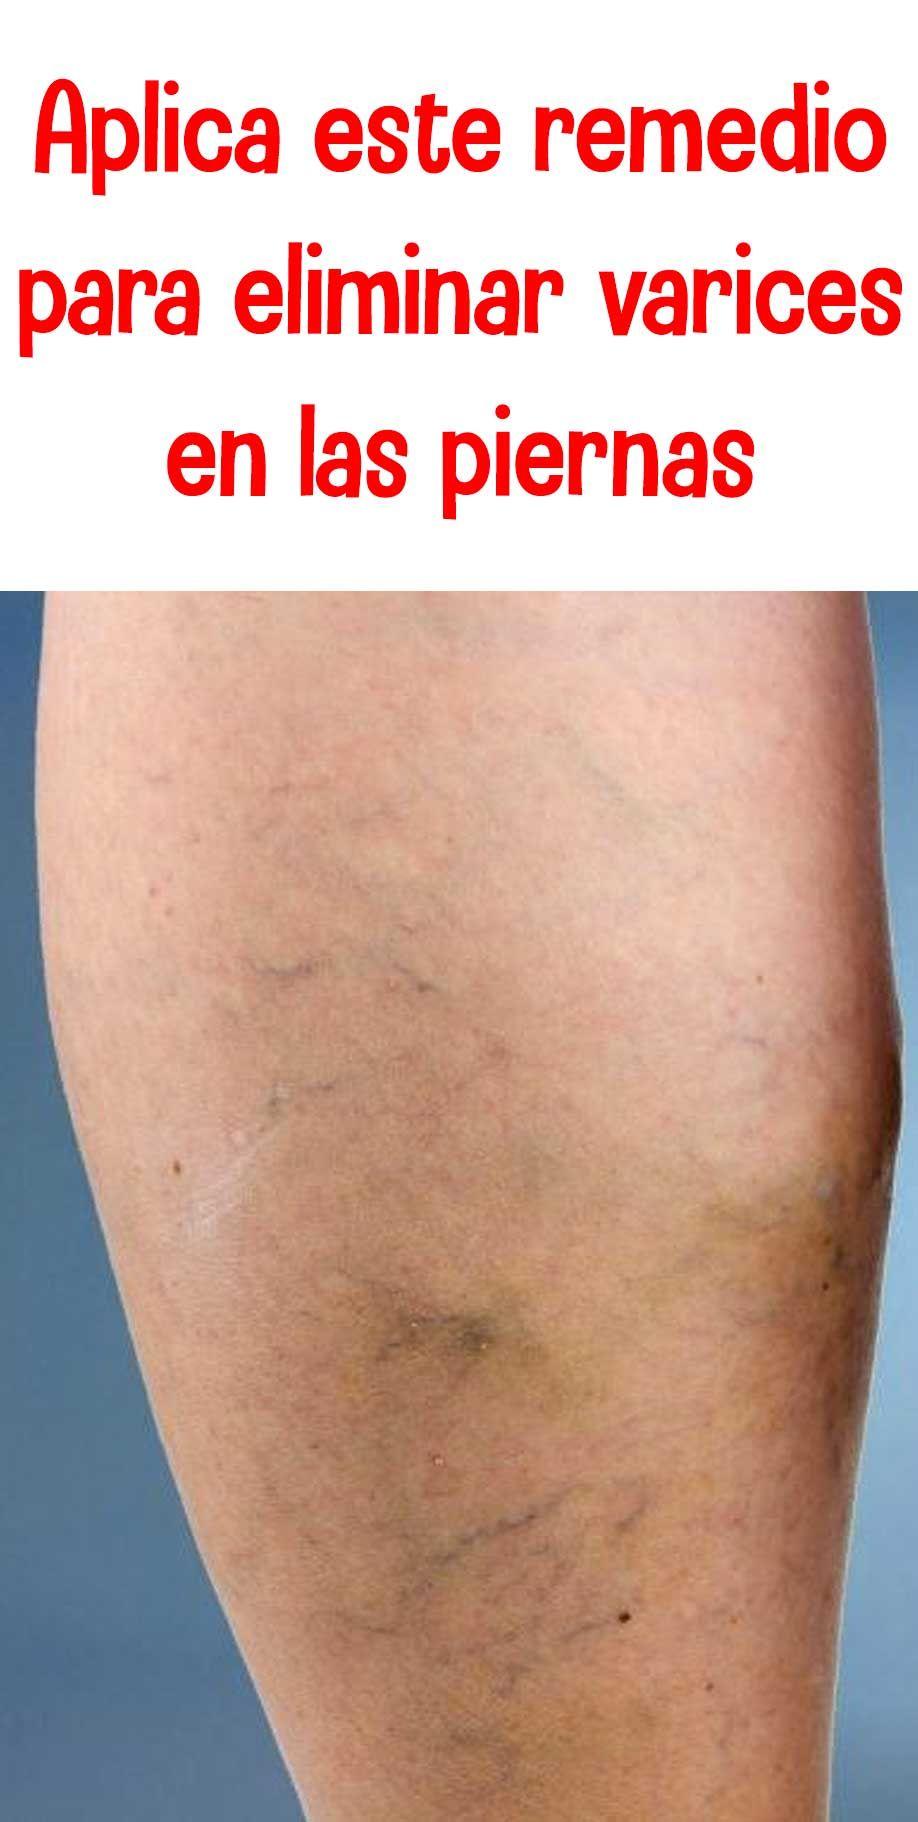 bolsillo de pus en la pierna